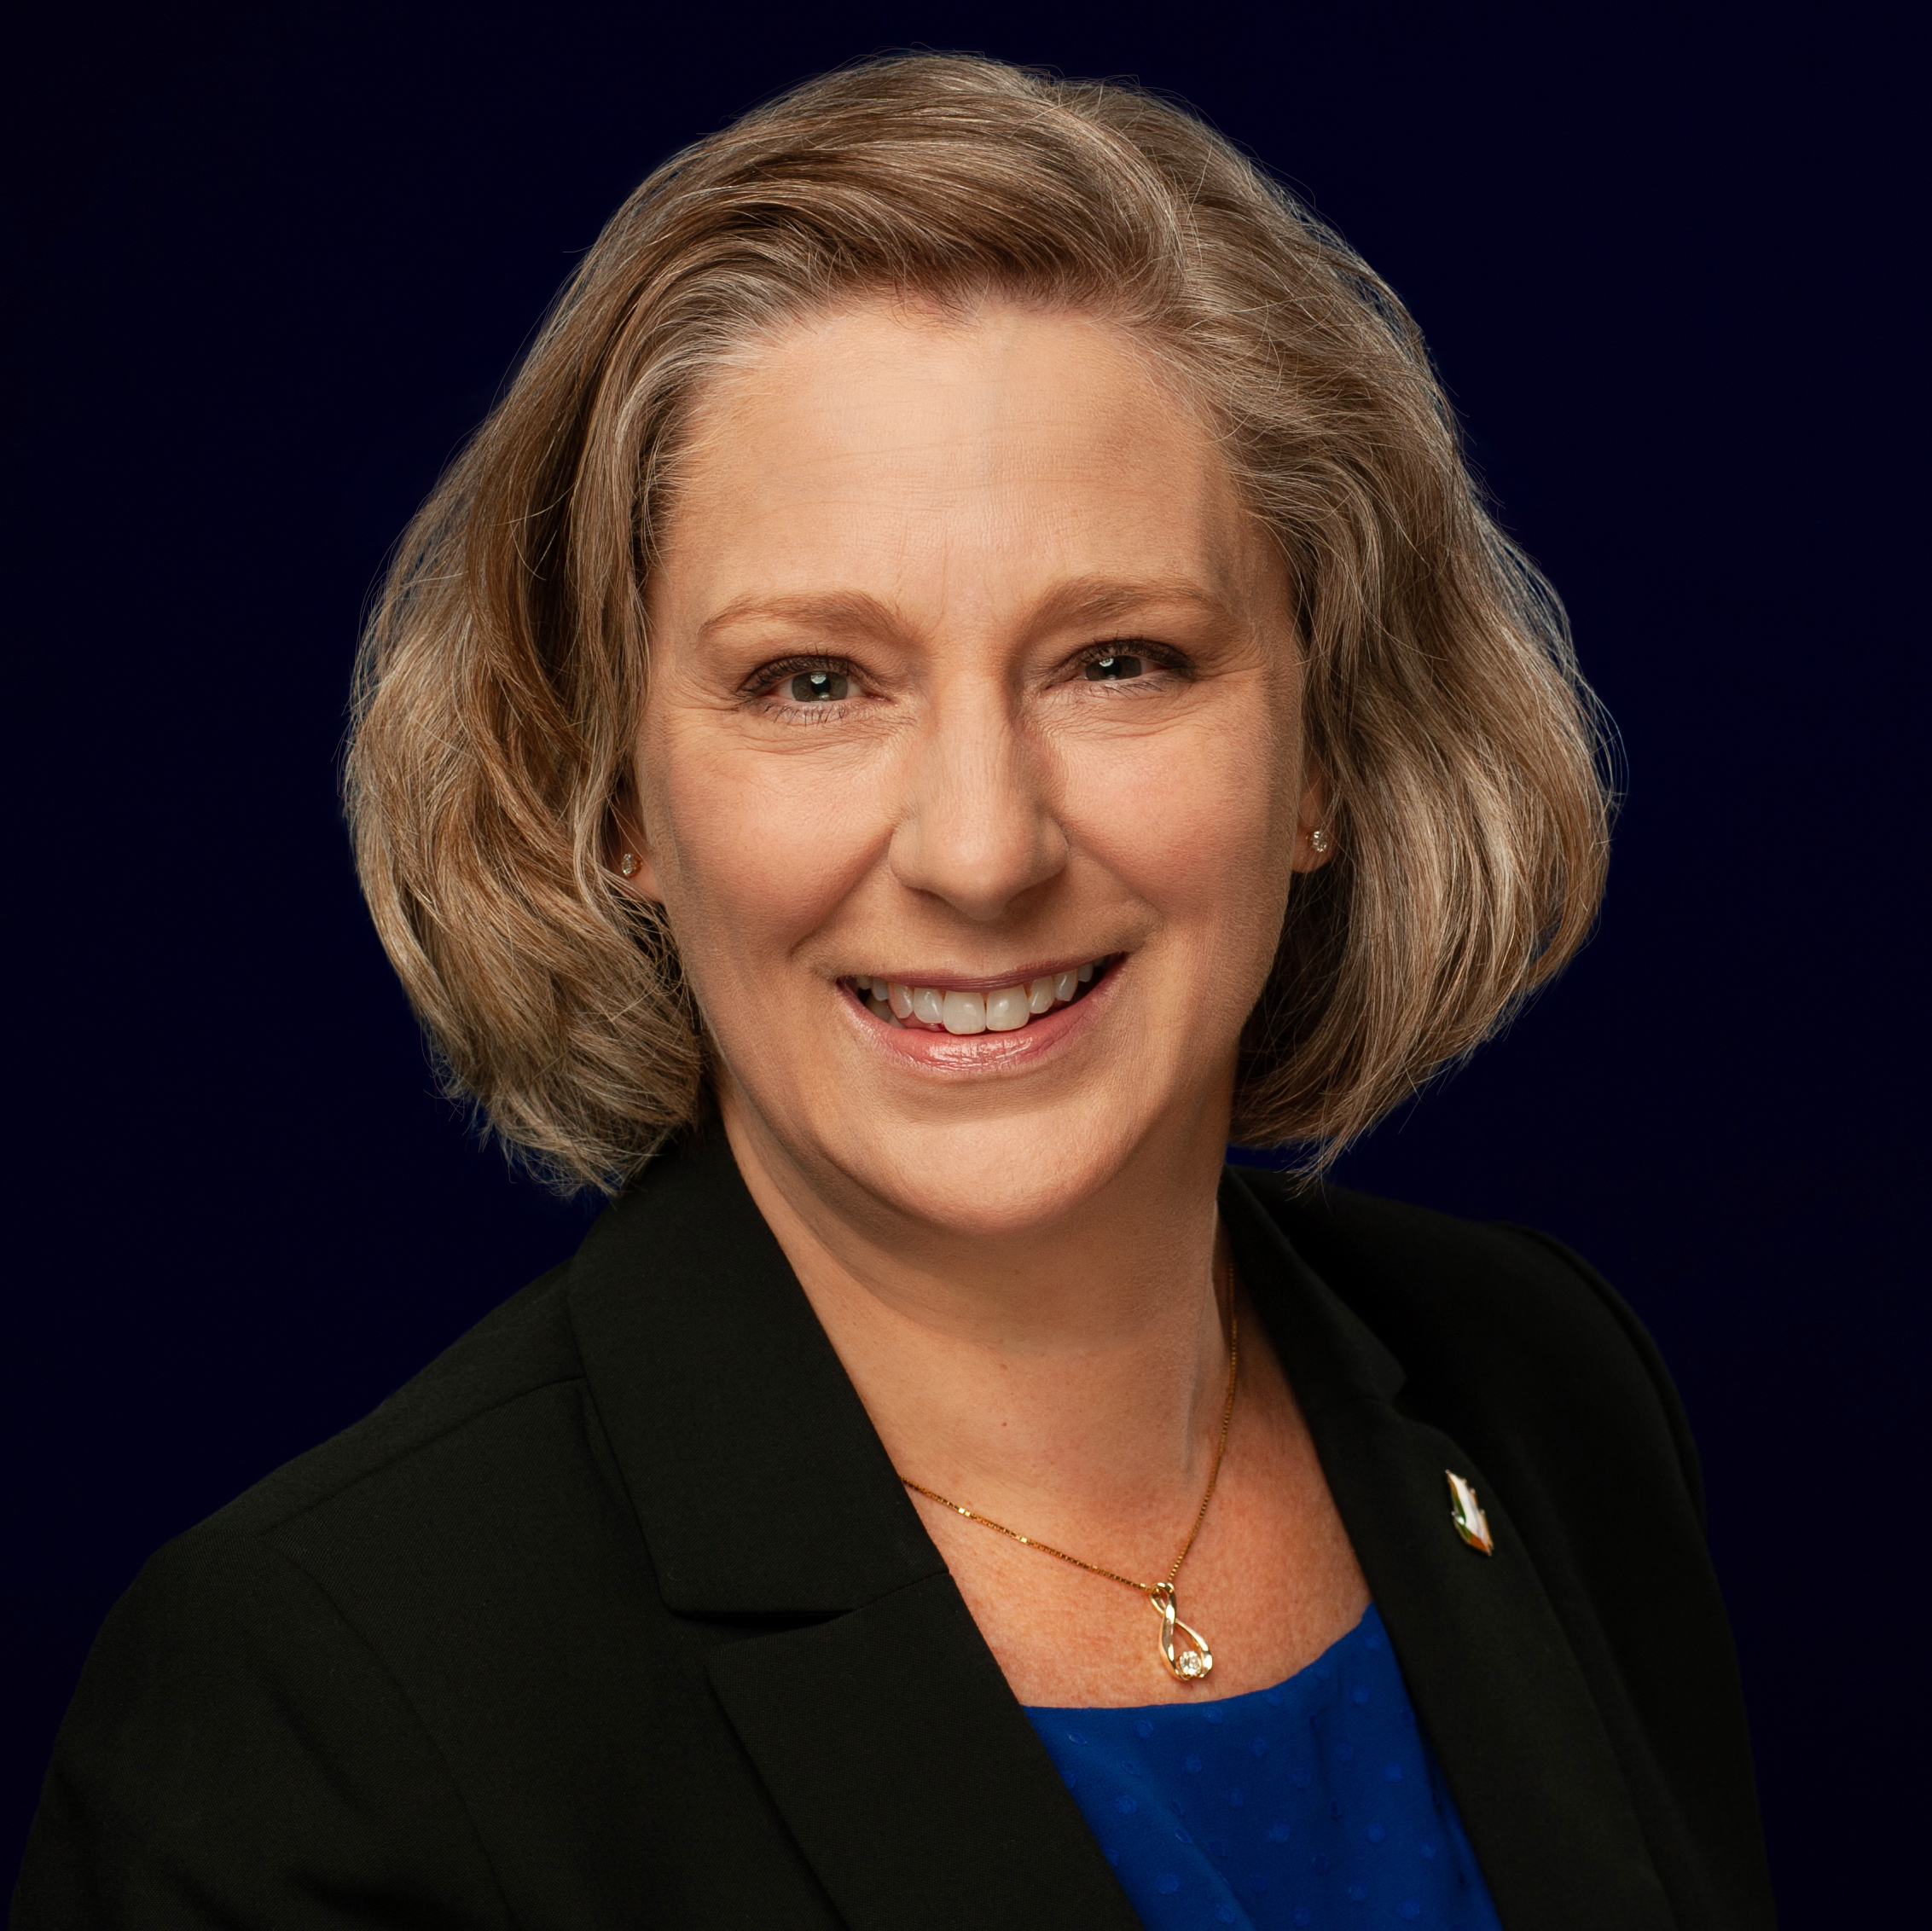 Jane Boatwright Wood, President